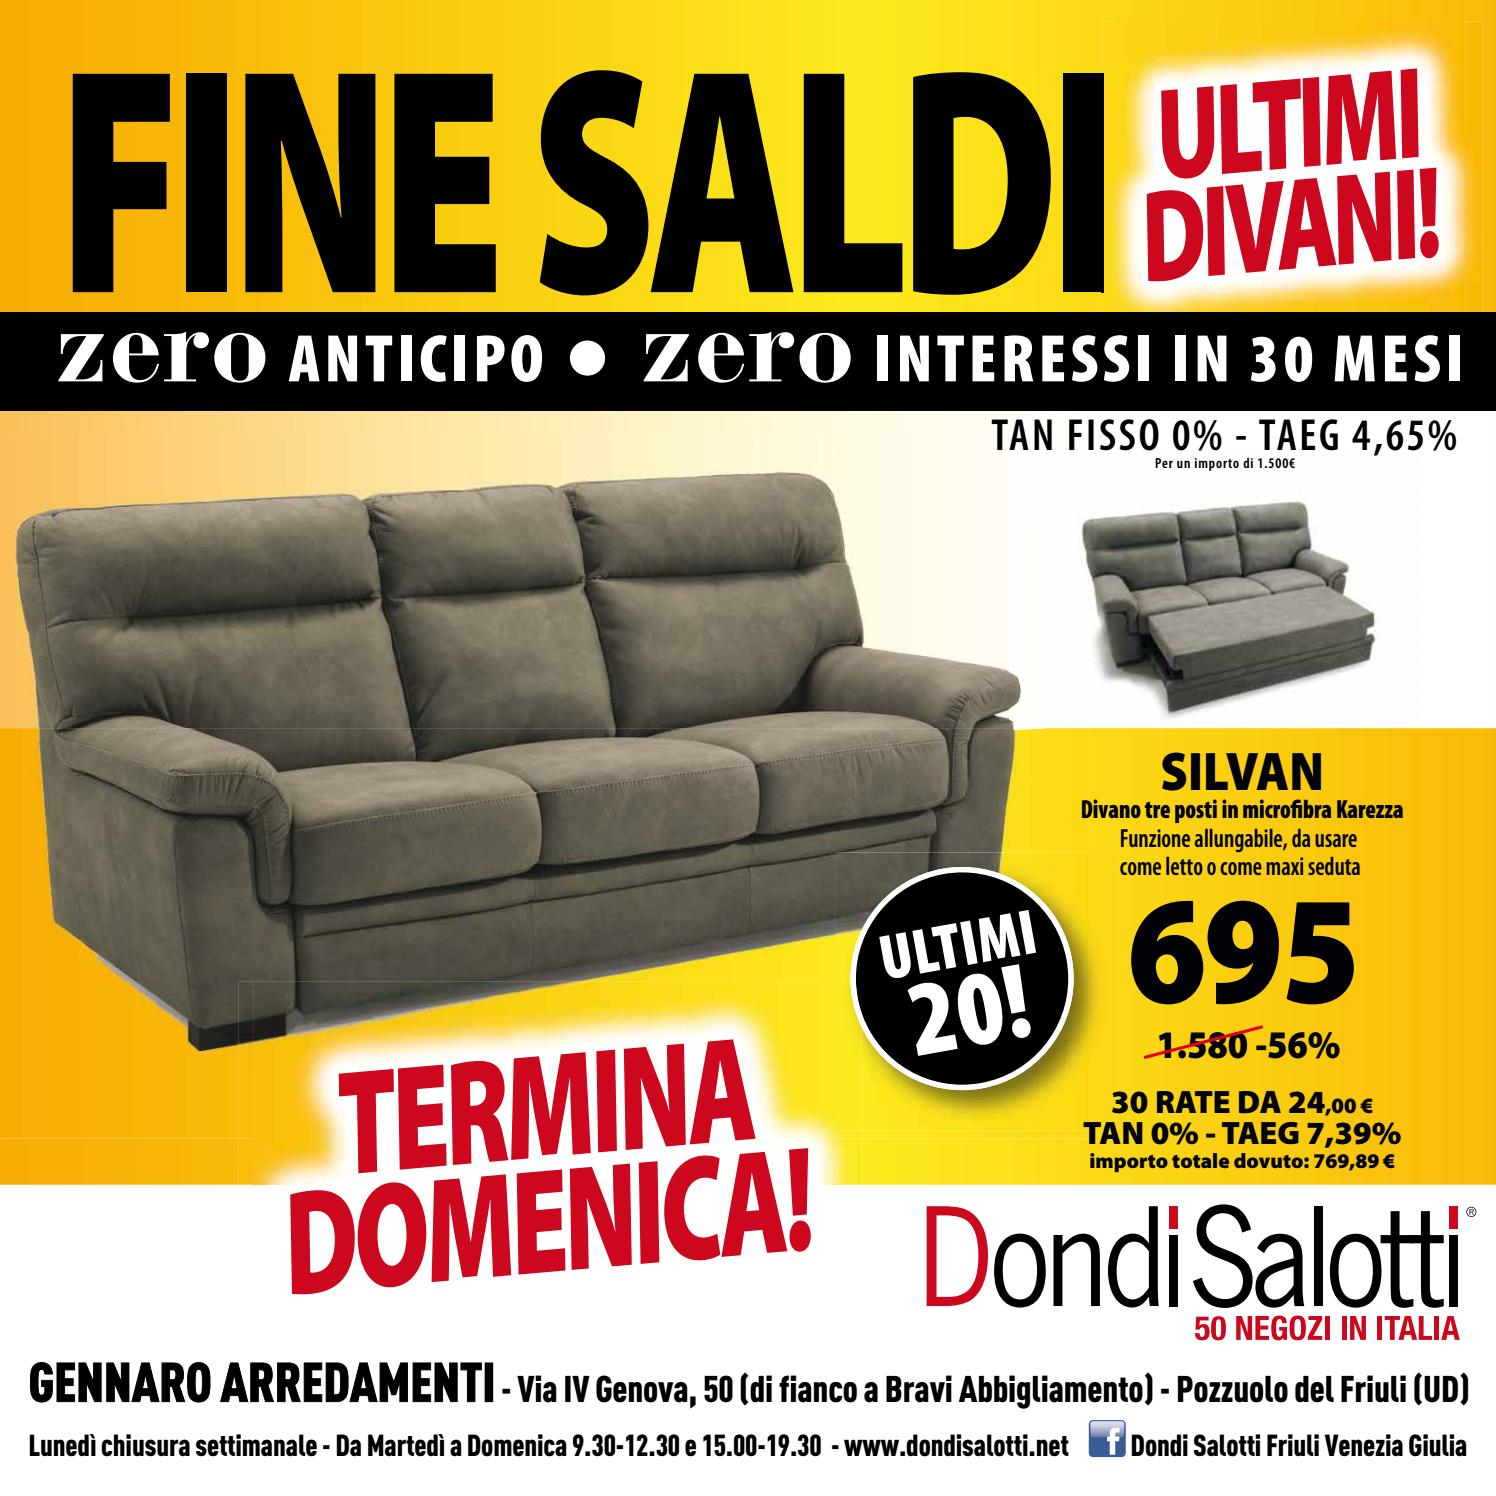 Saldi Dondi Salotti.Dondi Salotti Fine Saldi Udine By Michele Travagli Issuu